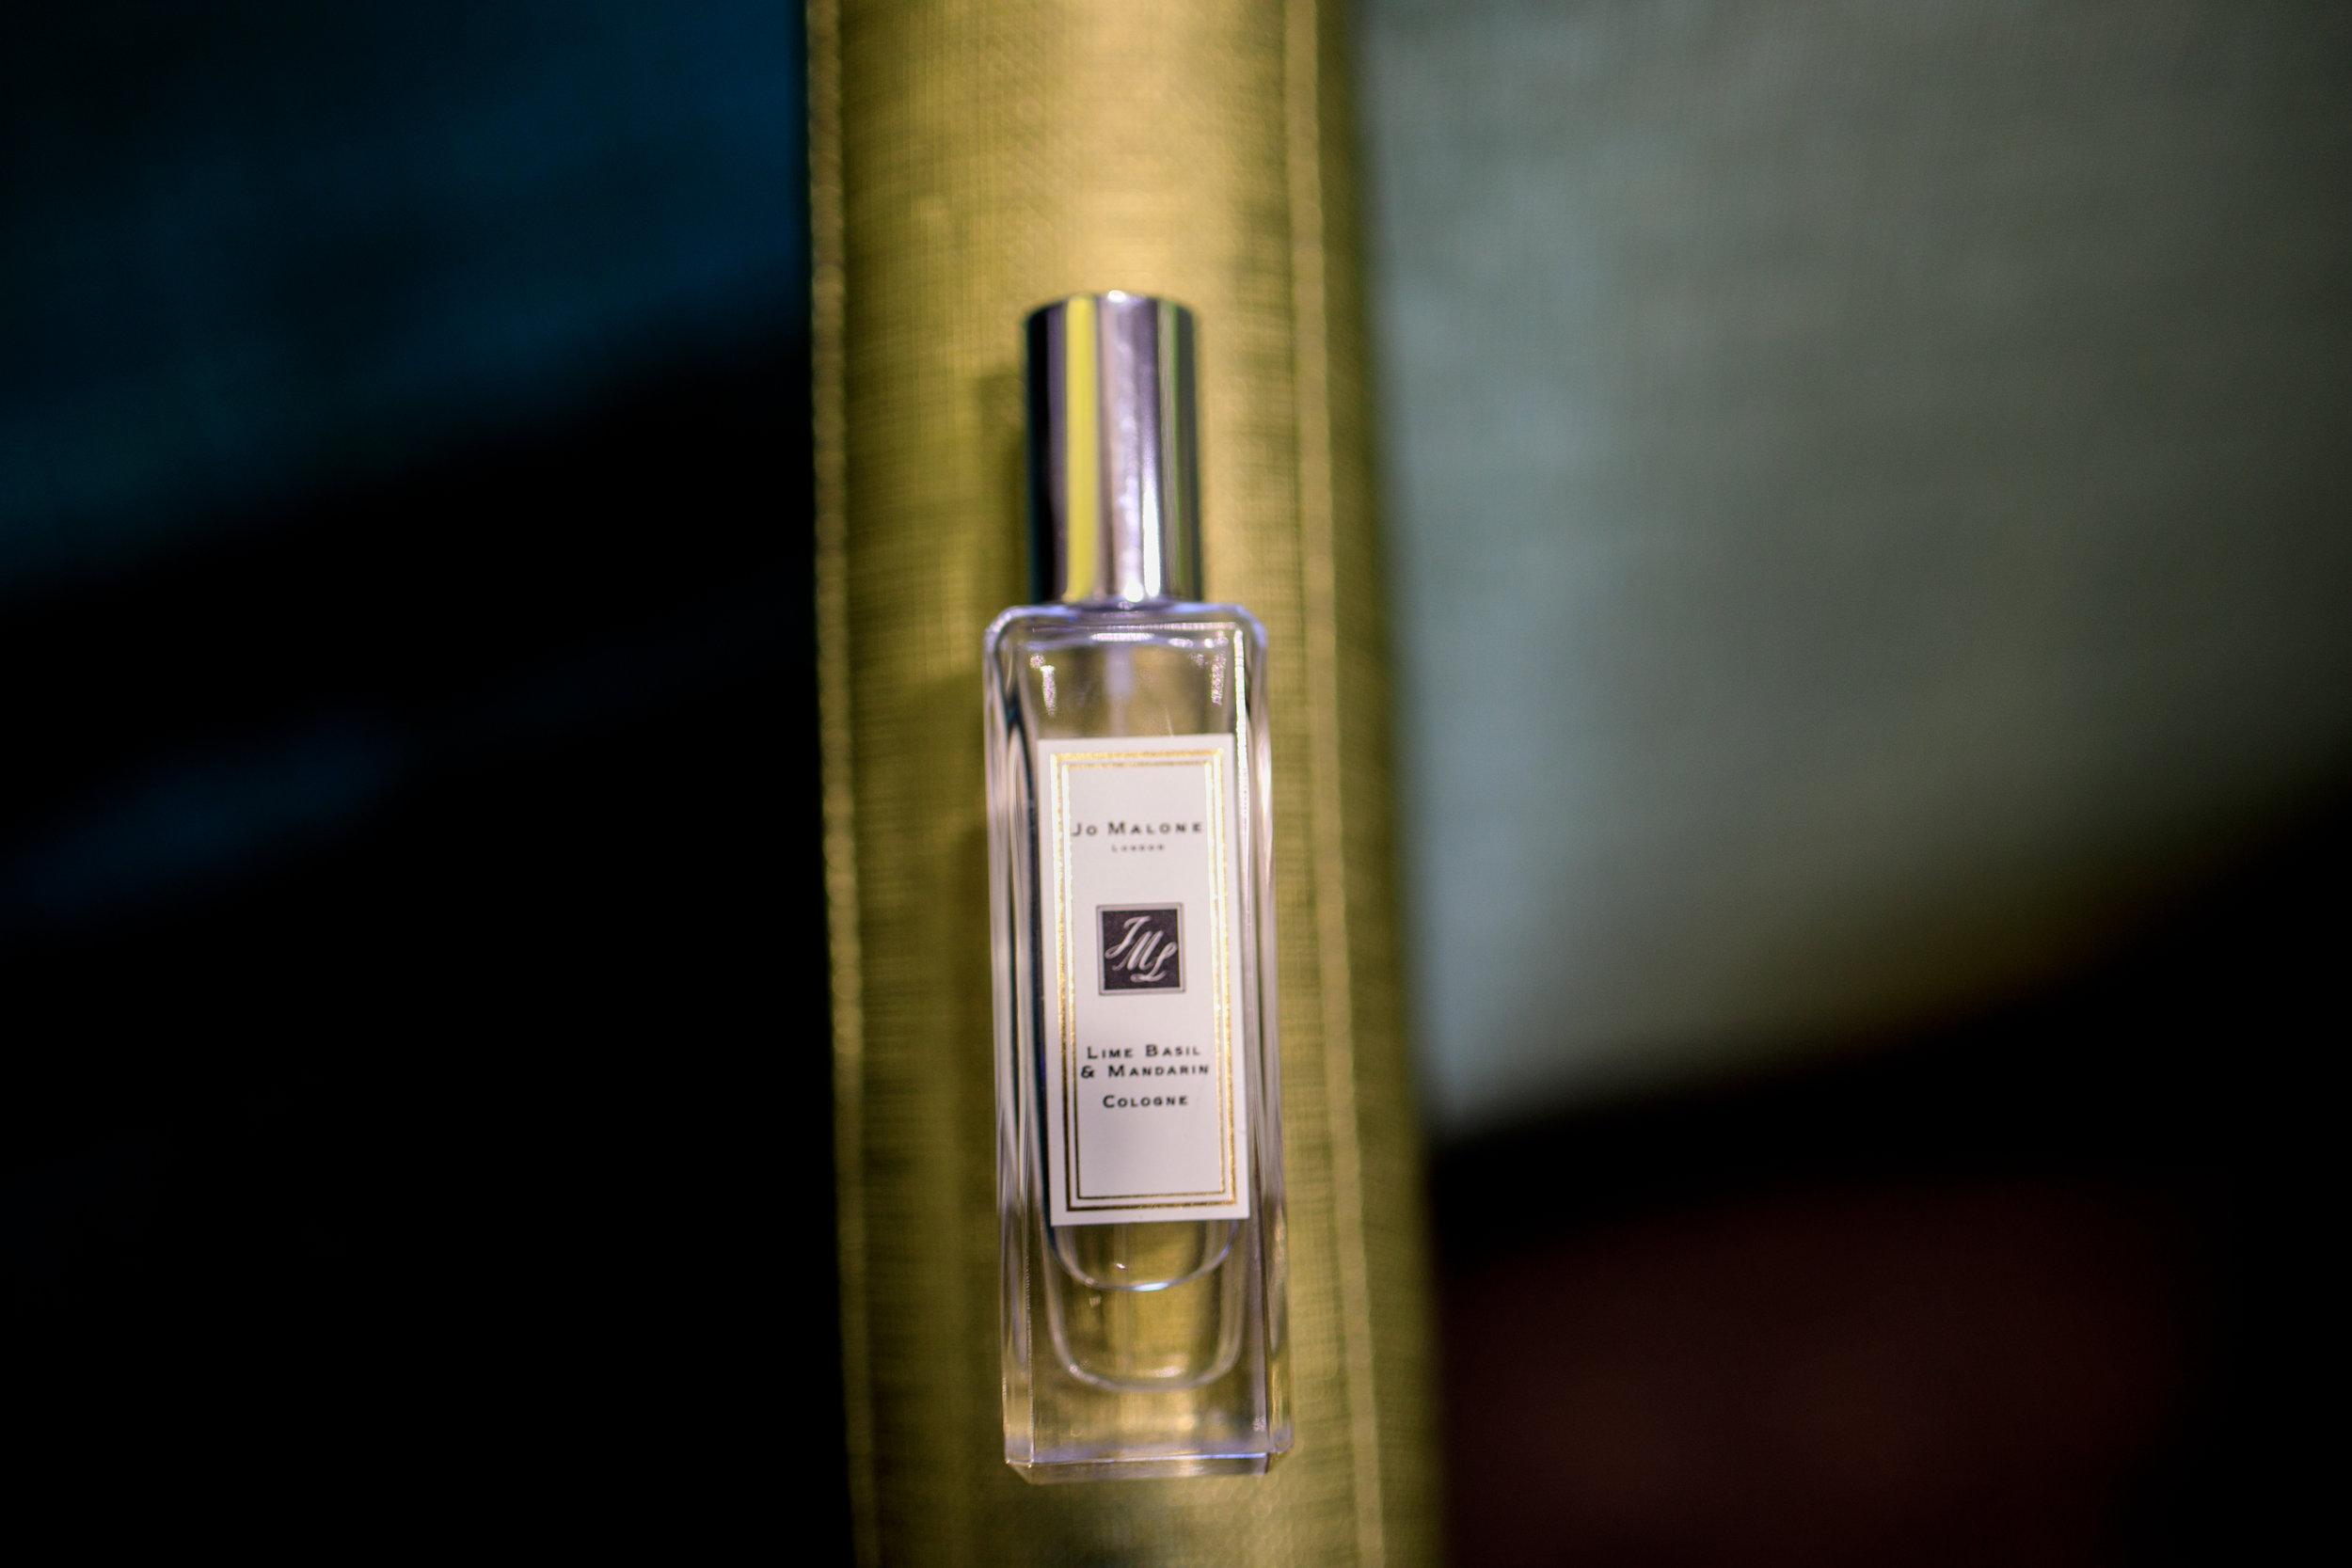 Lauren-ashley-studios-photography-details-perfume.jpg